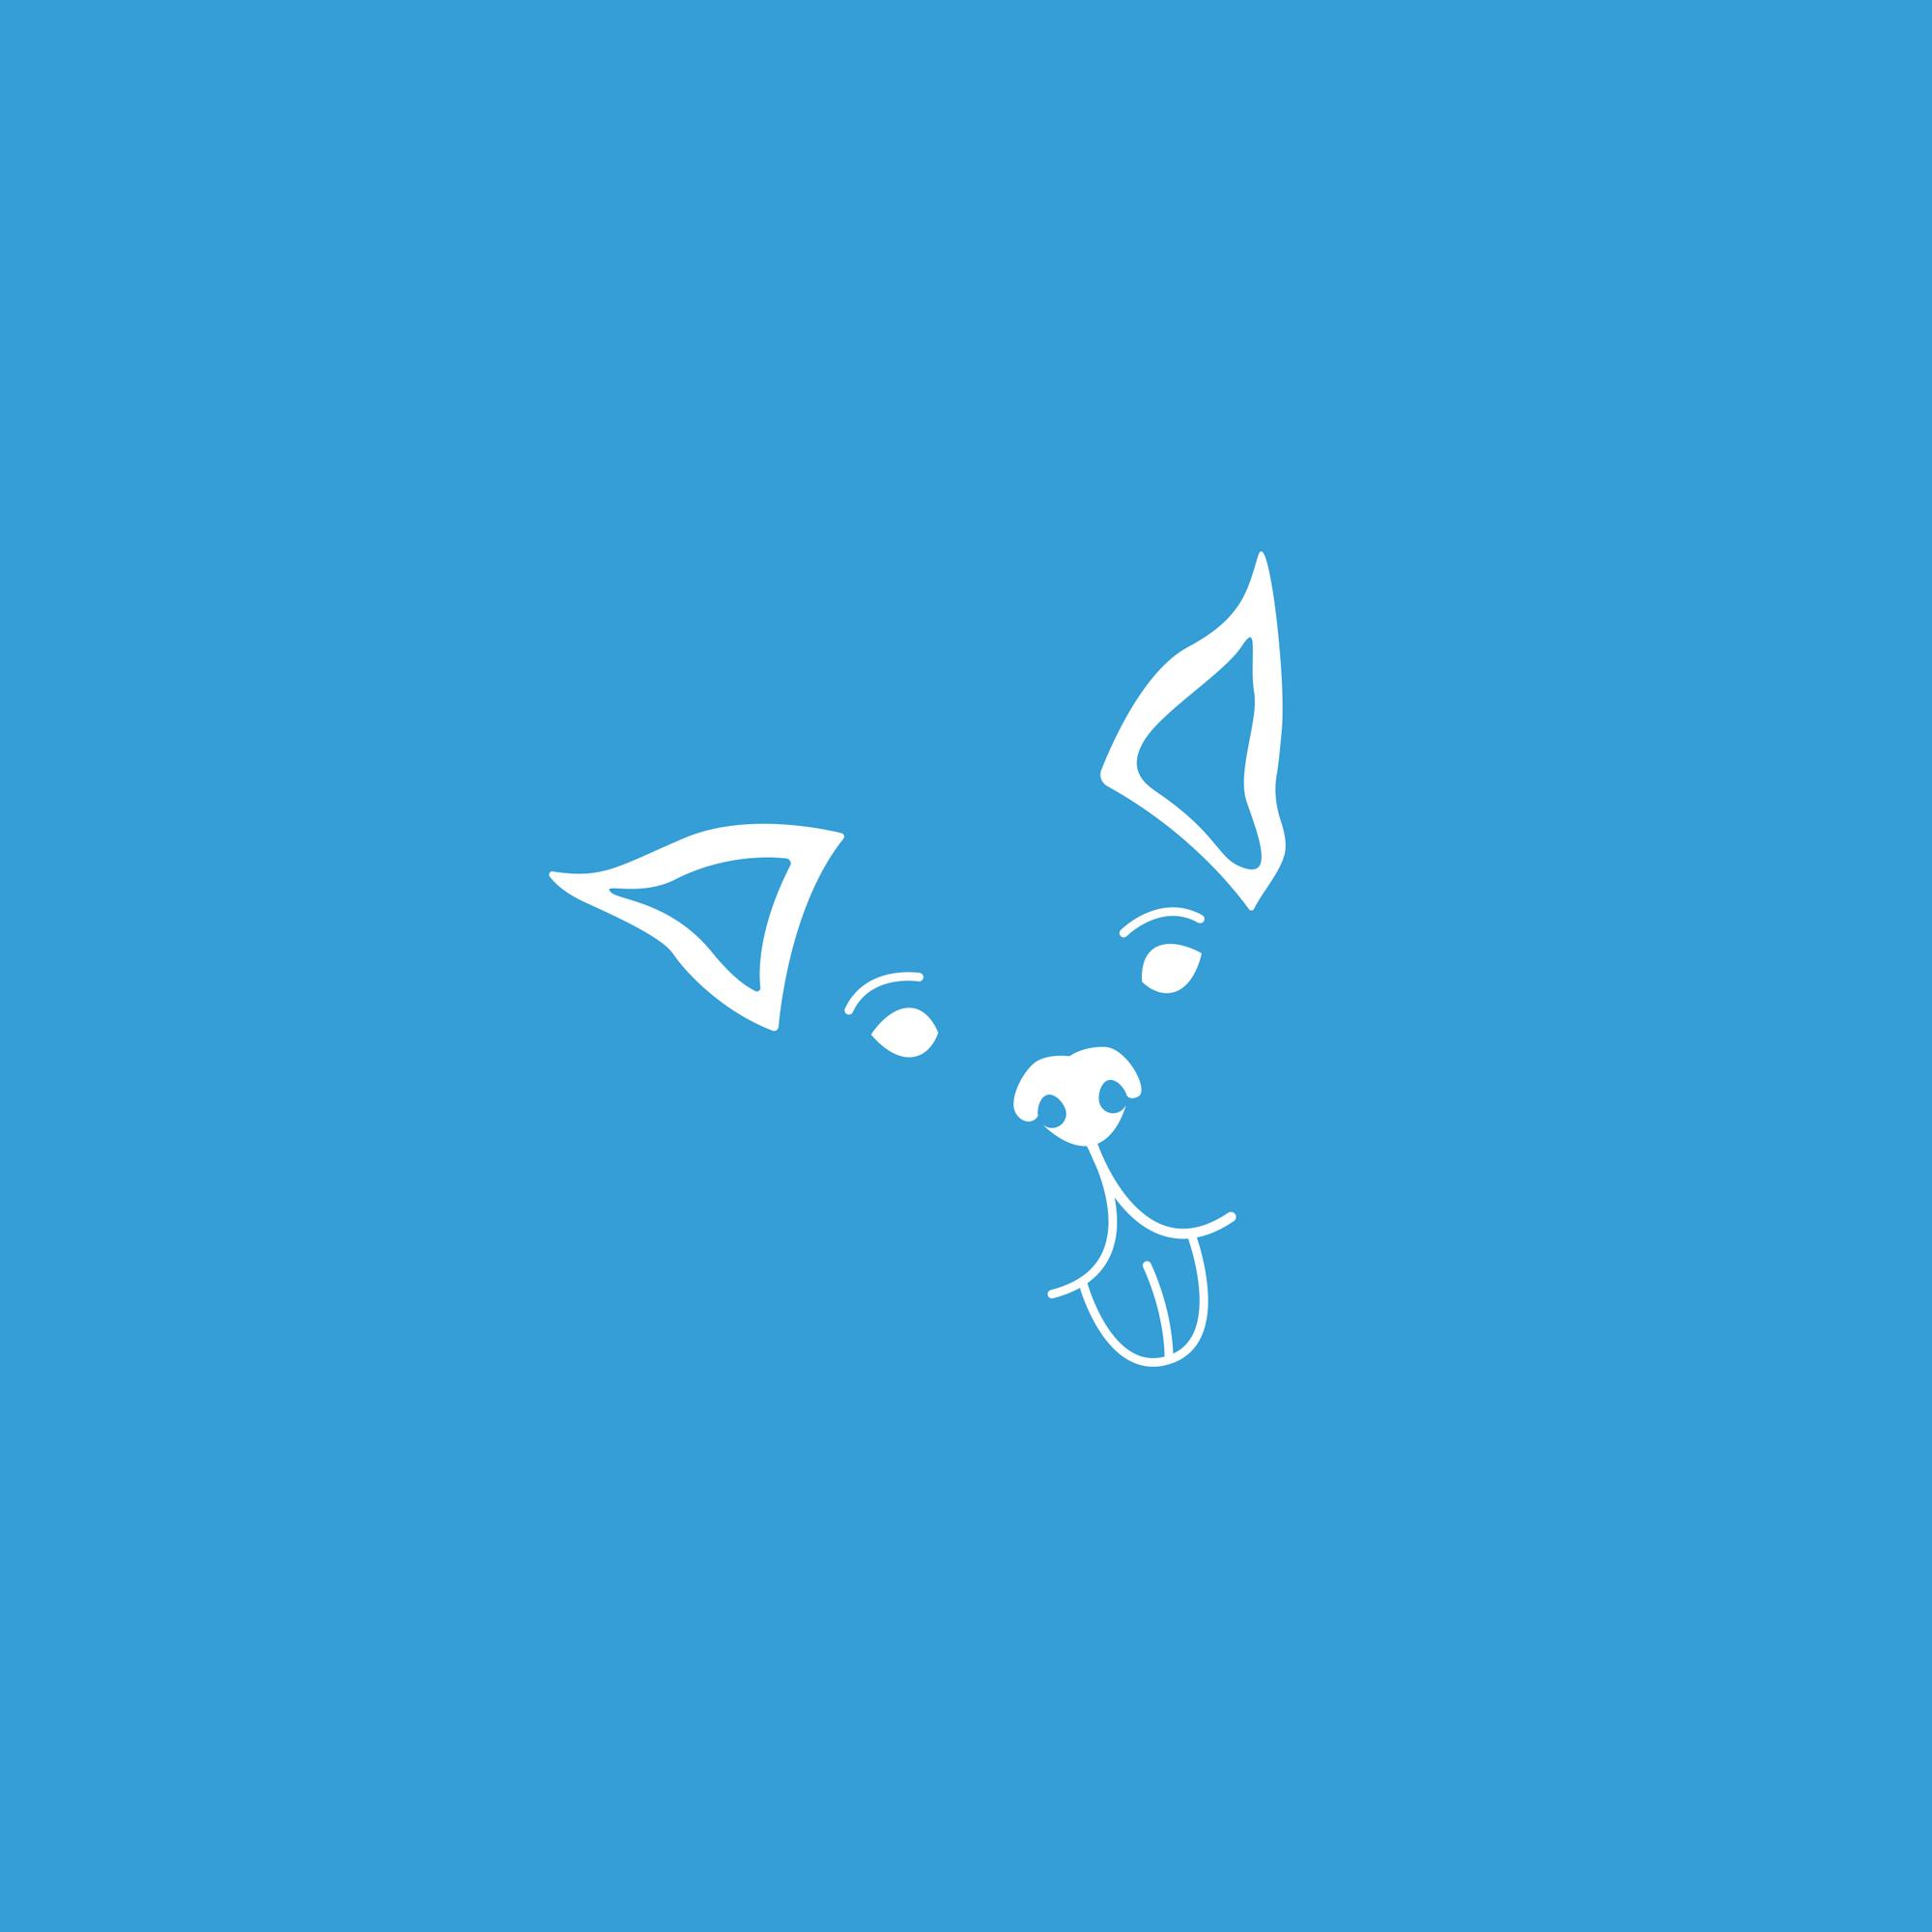 tims-naturals-pet-product-dog-illustration.jpg